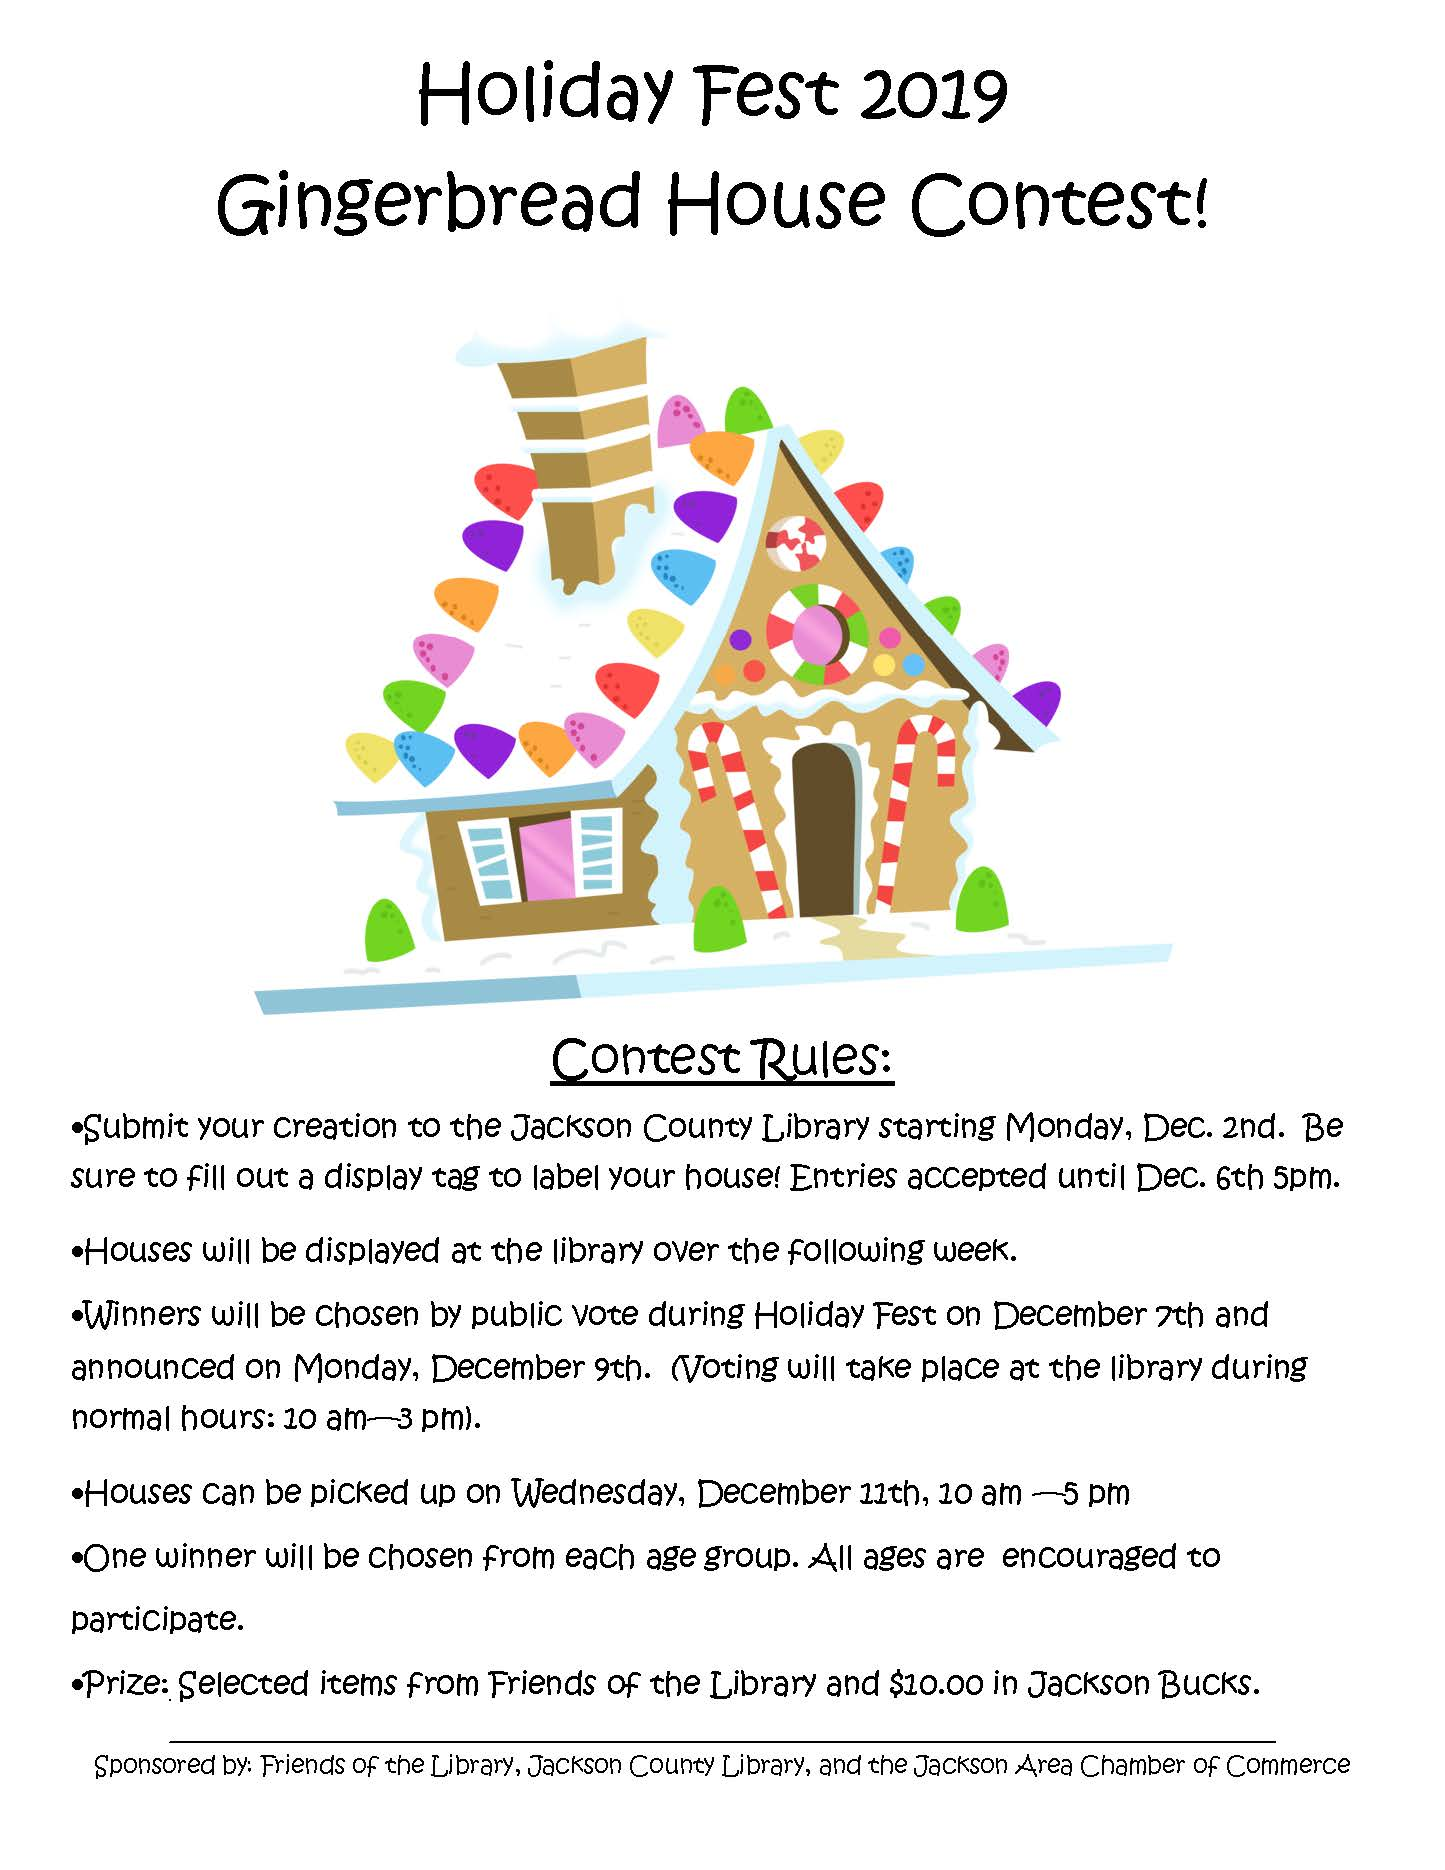 Gingerbread-House-Flier_2018.jpg